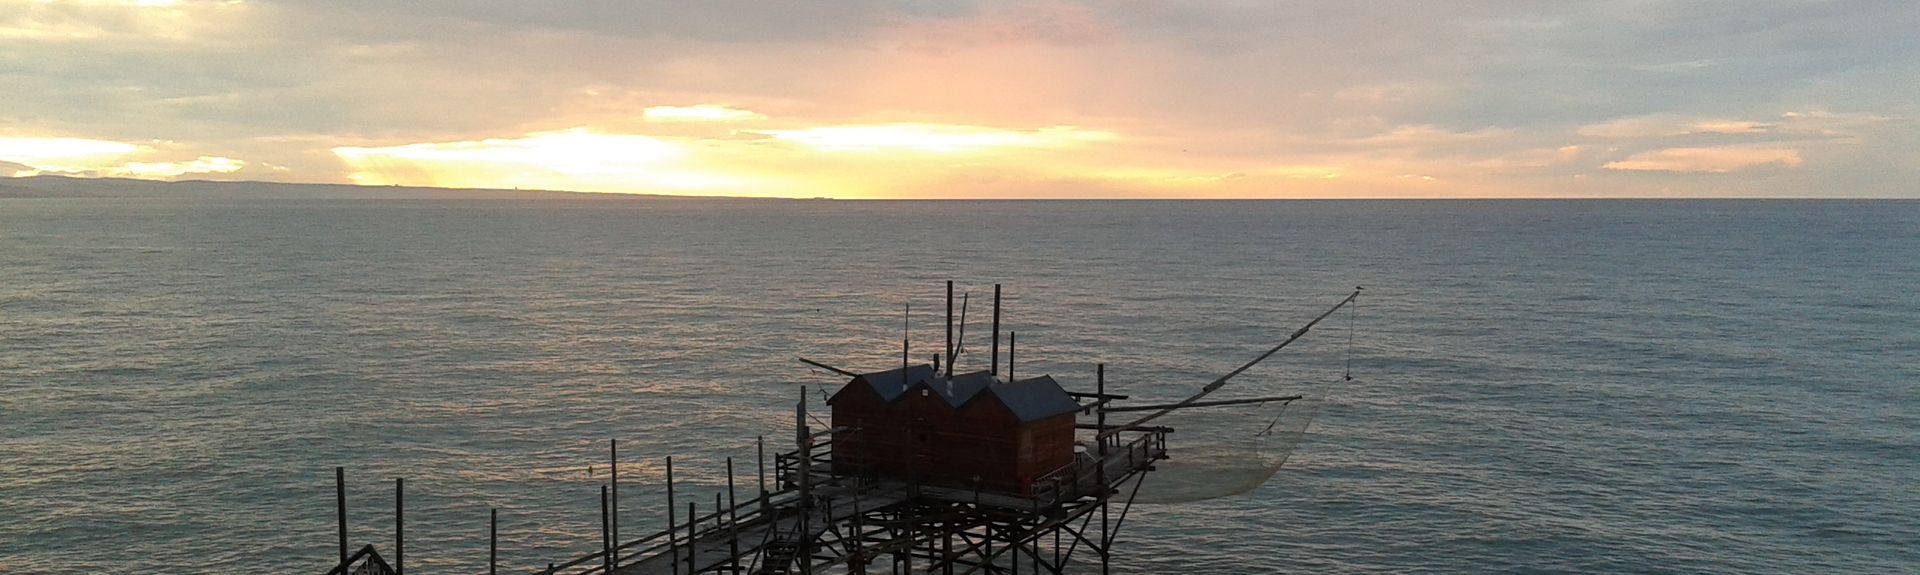 Campomarino, Molise, Italia